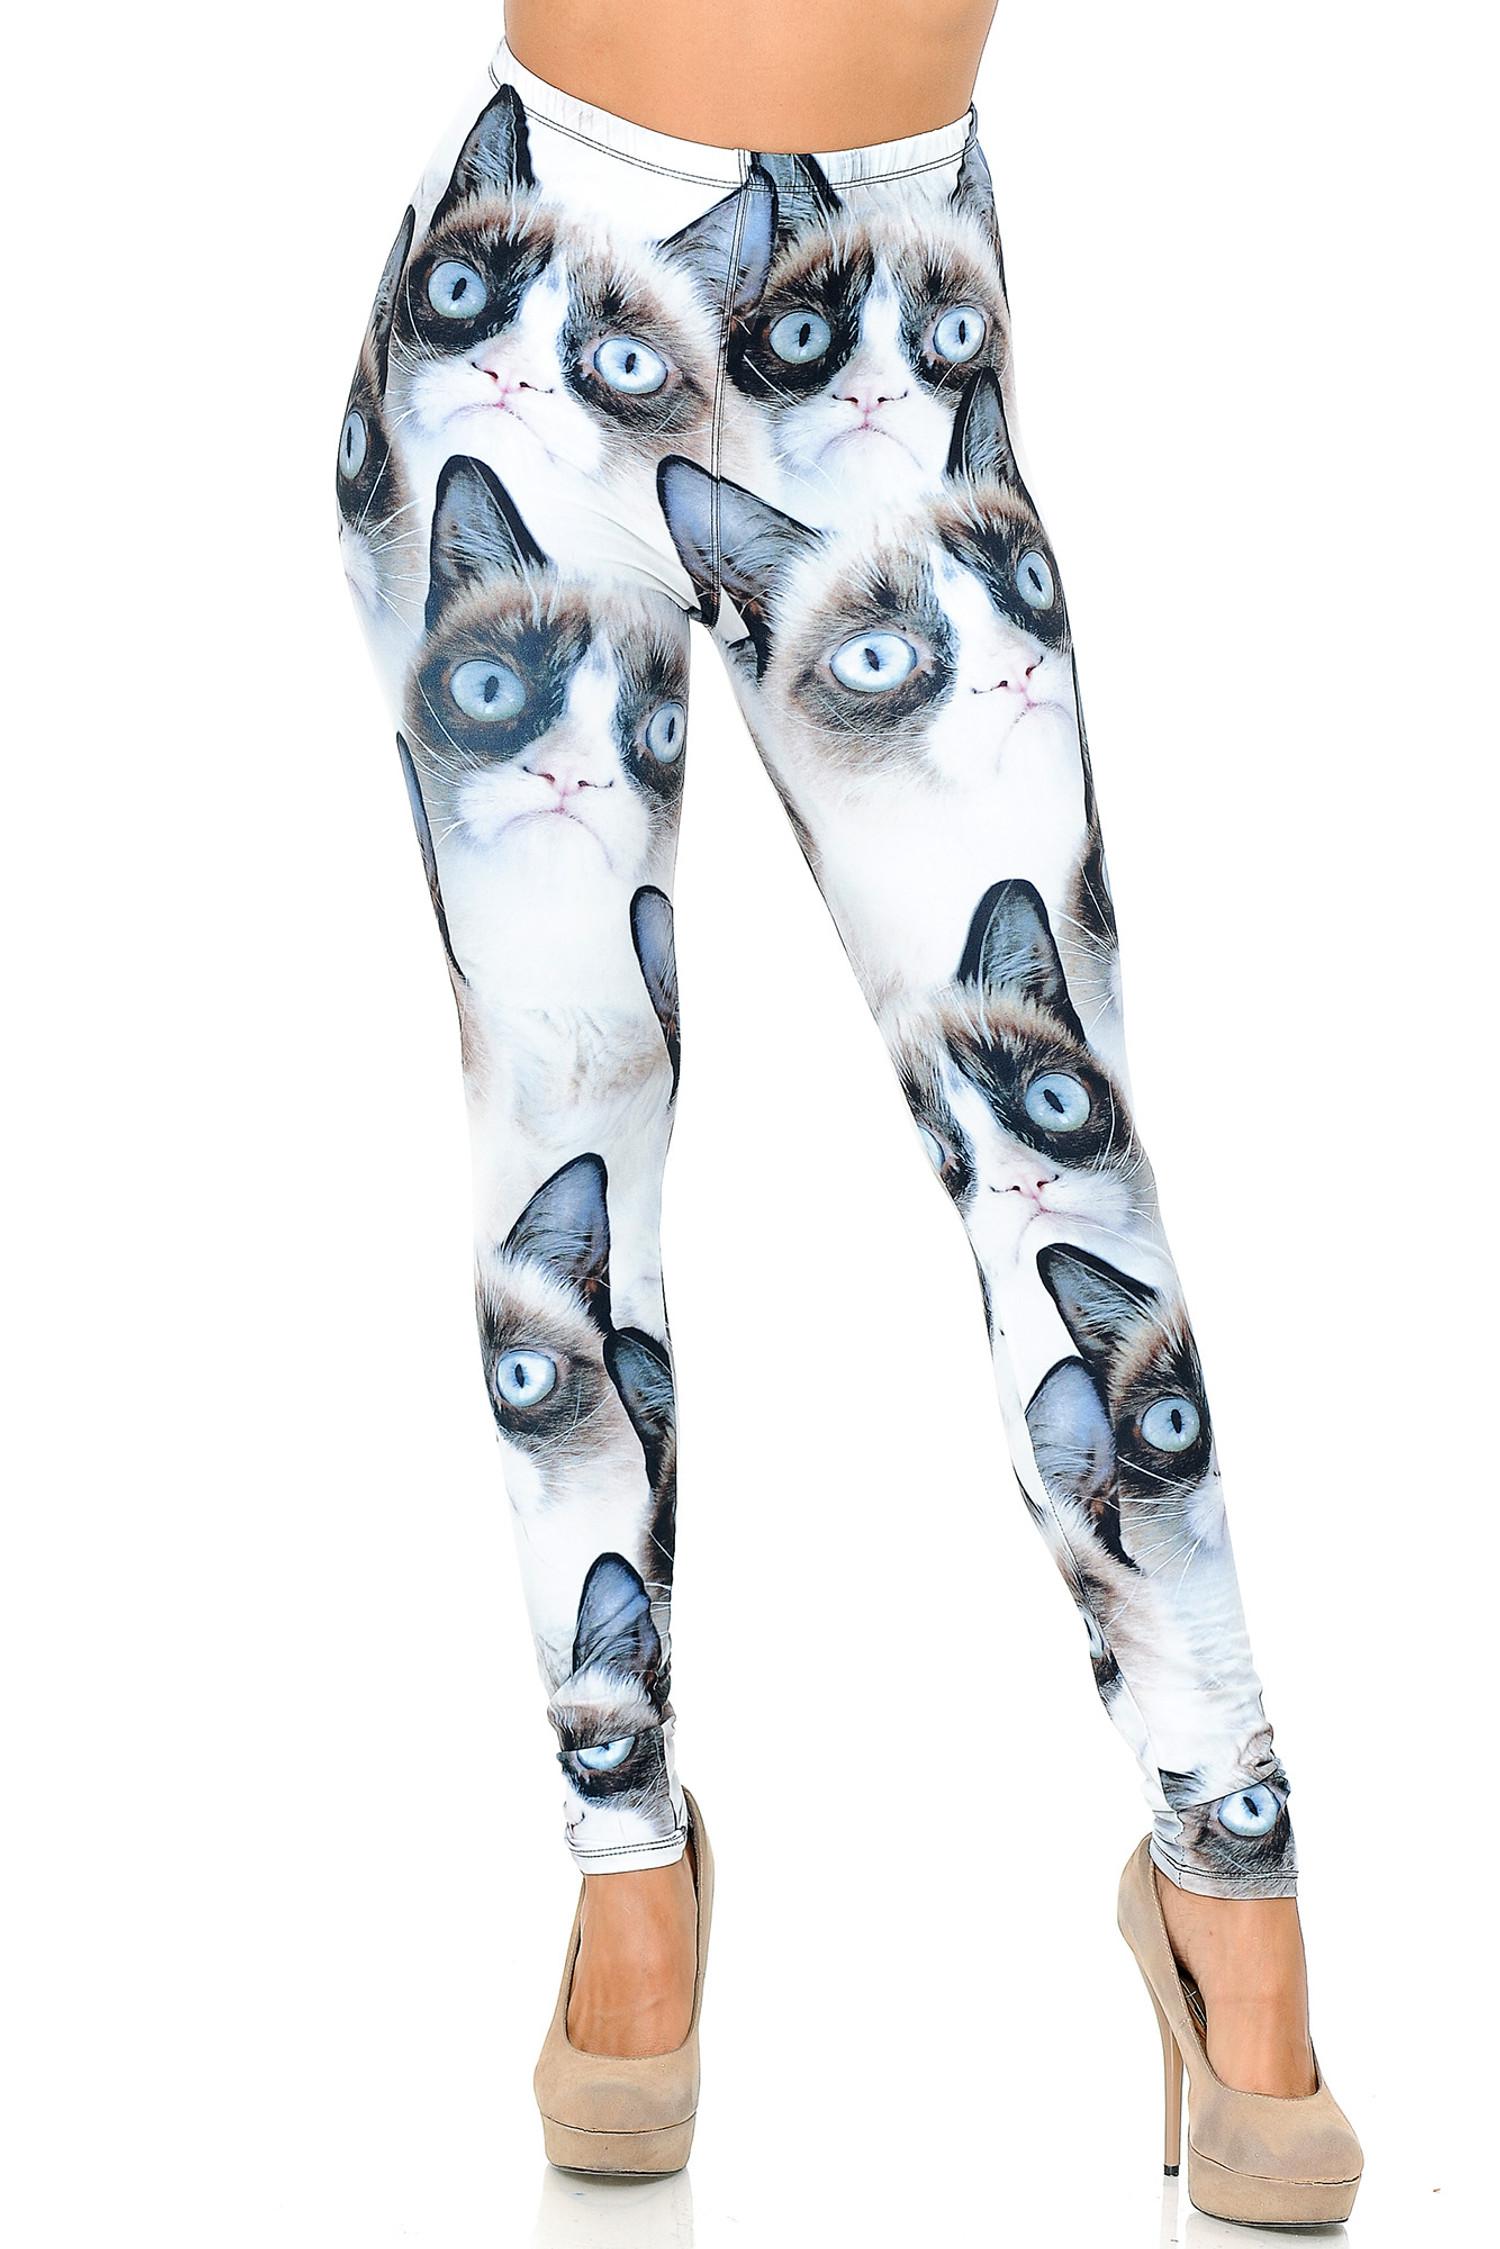 Creamy Soft Grumpy Cat Plus Size Leggings - USA Fashion™